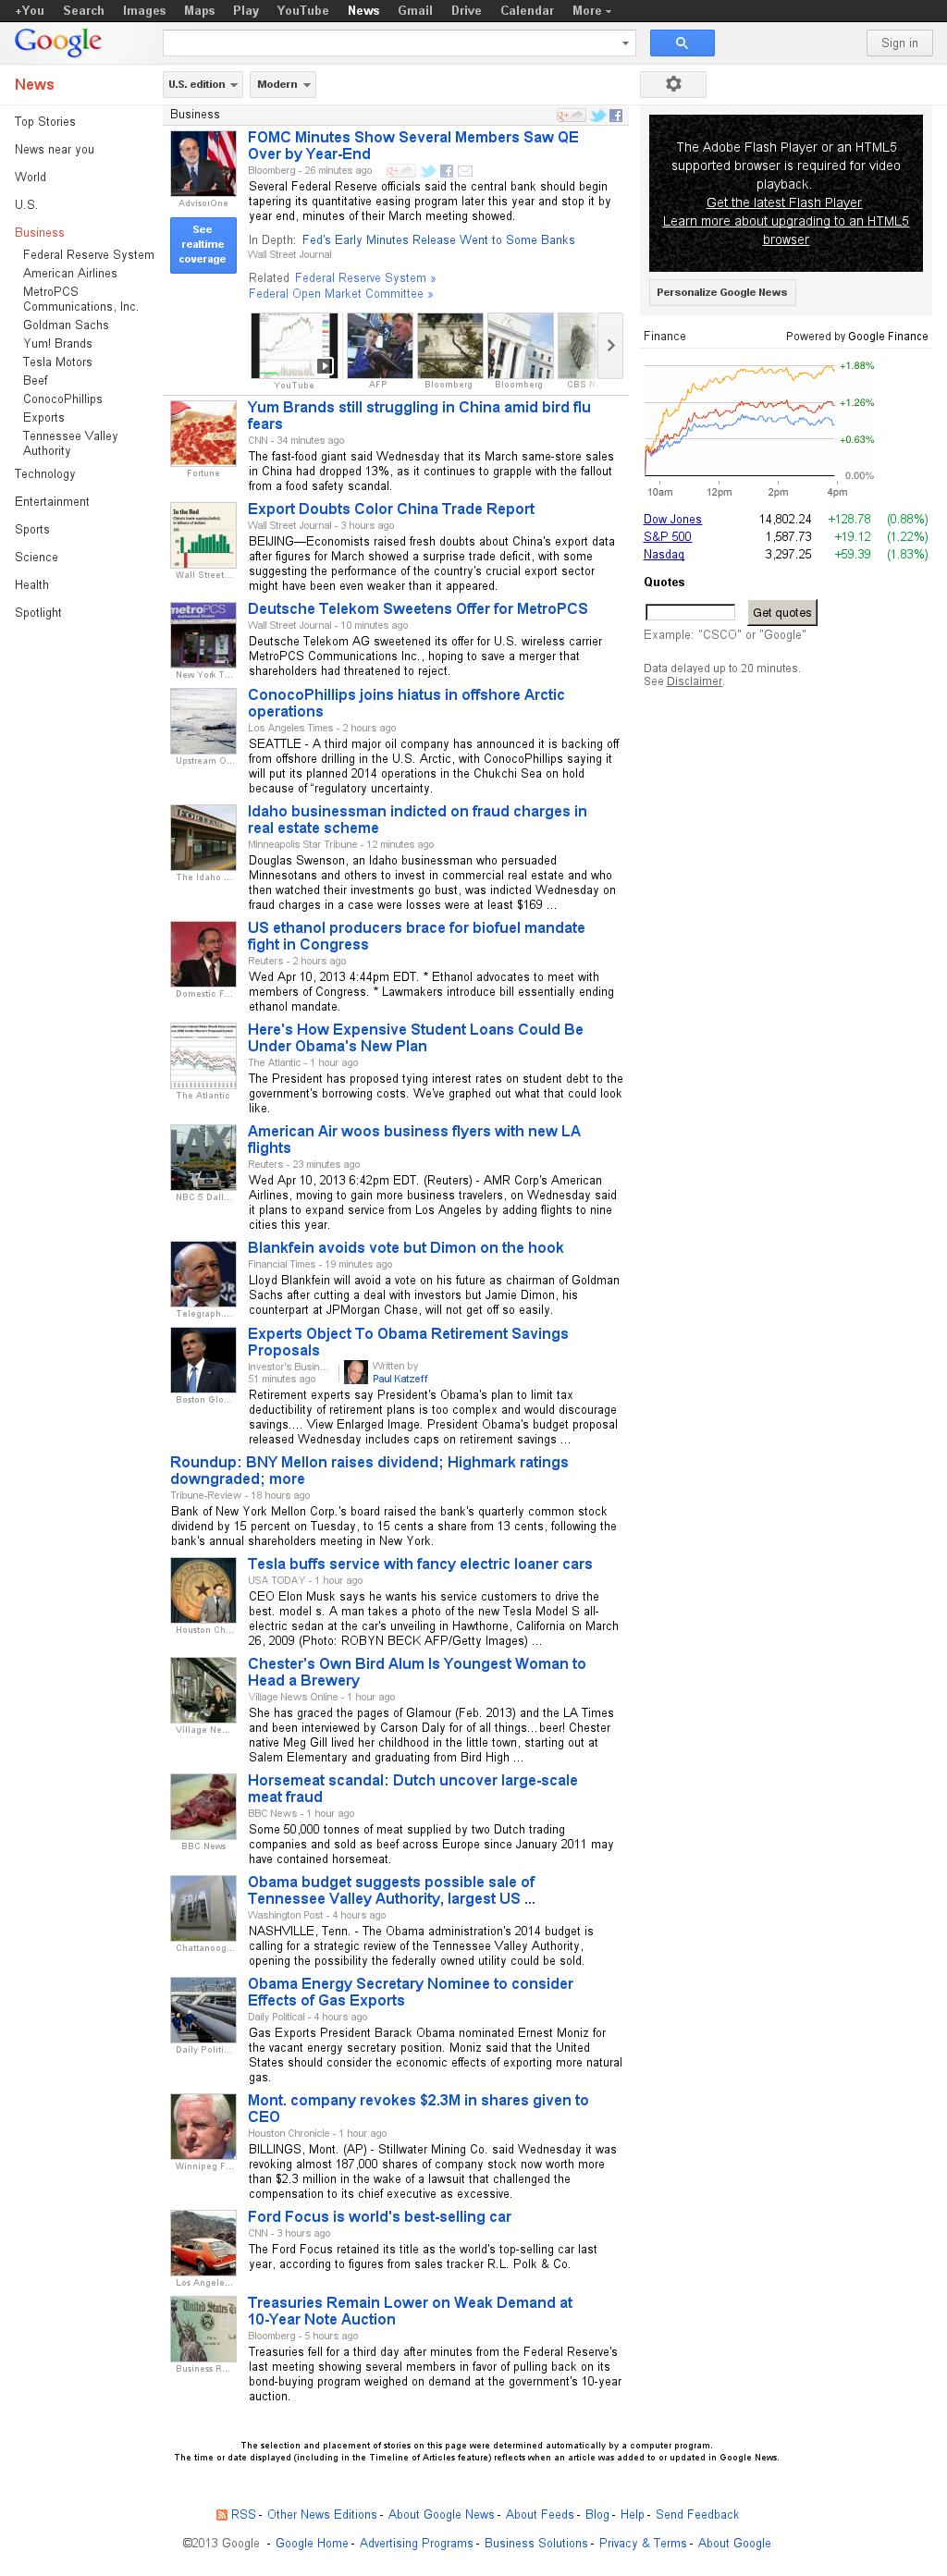 Google News: Business at Wednesday April 10, 2013, 11:09 p.m. UTC